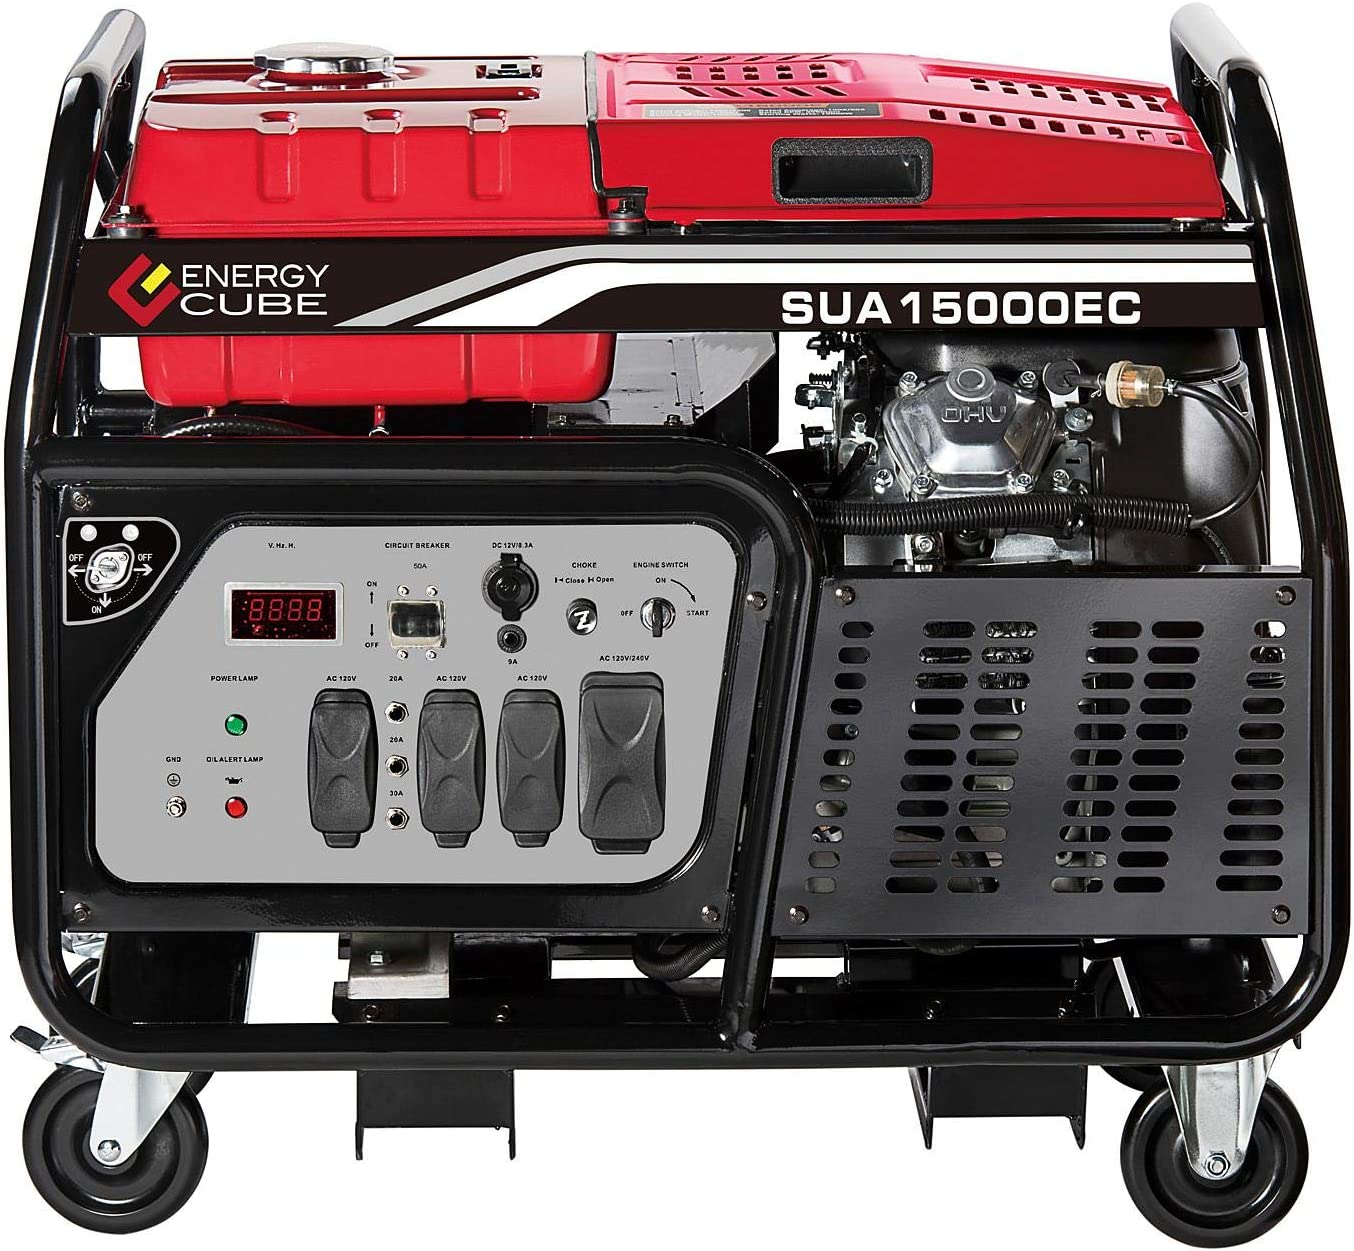 A-iPower SUA15000EC SUA15000E 15000 Watt Ultra Heavy Duty Generator, EPA/CARB COMPLIED Ship to All 50 States